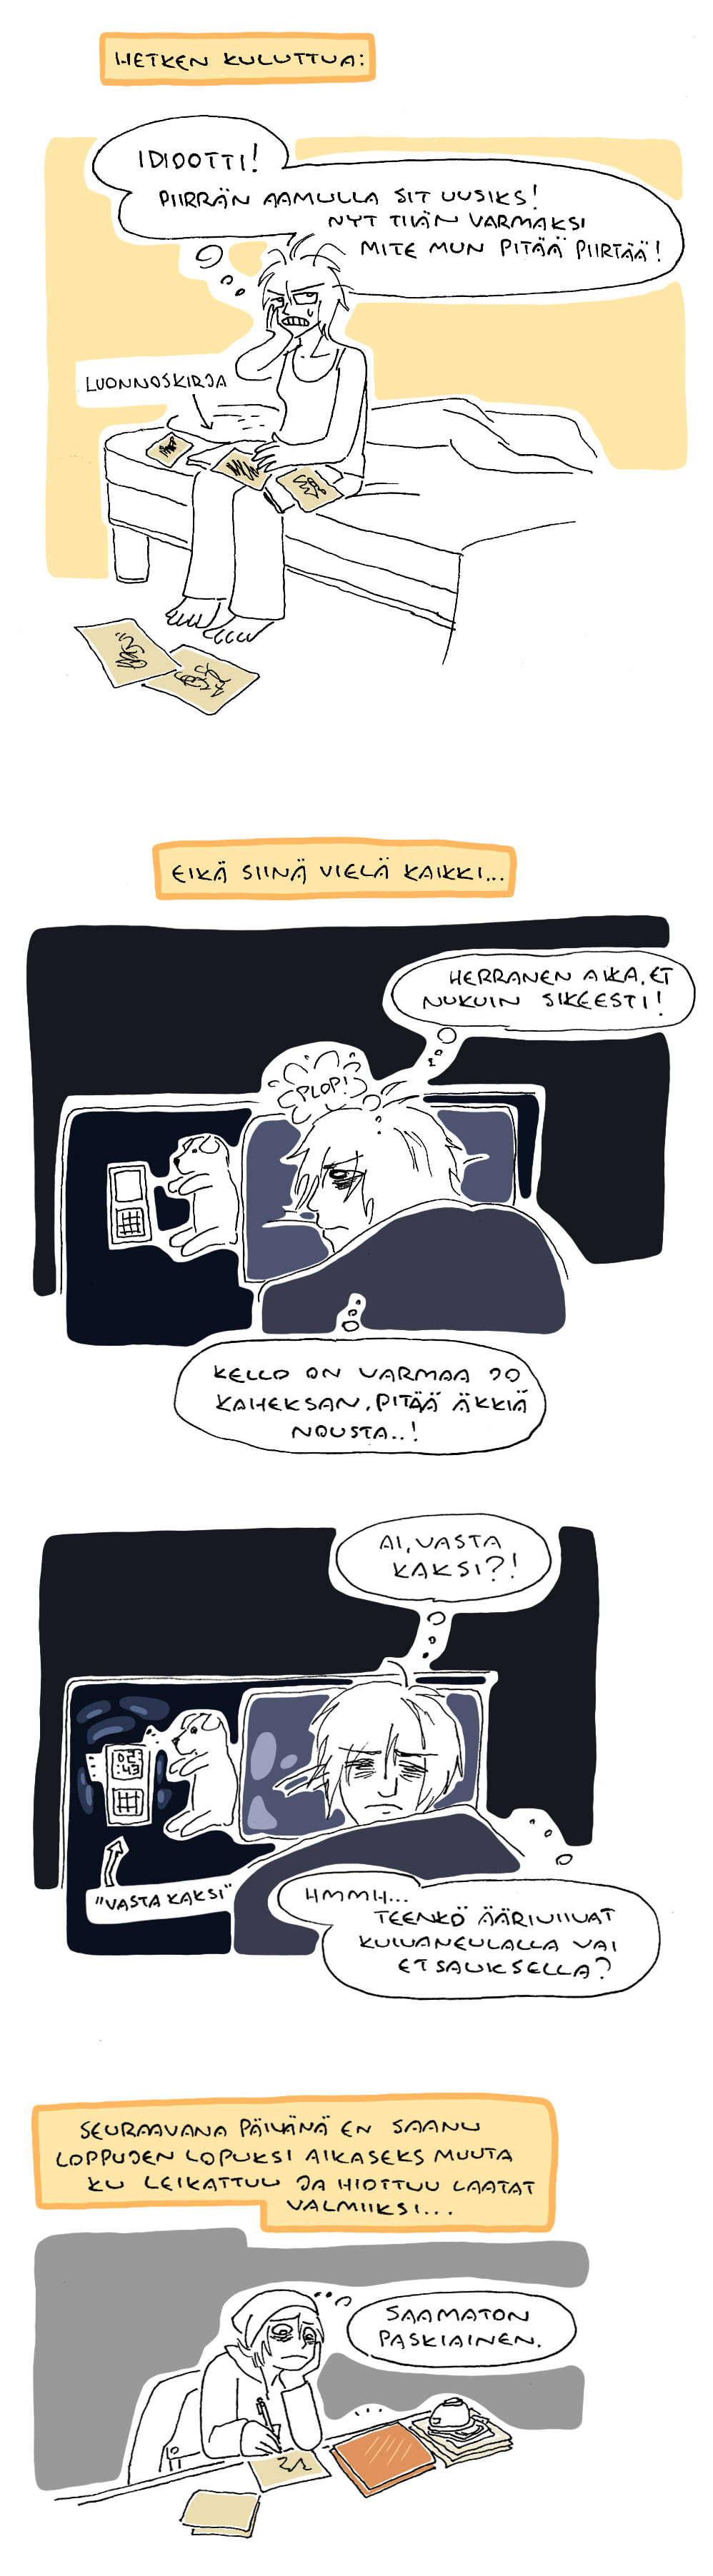 saerjis364k